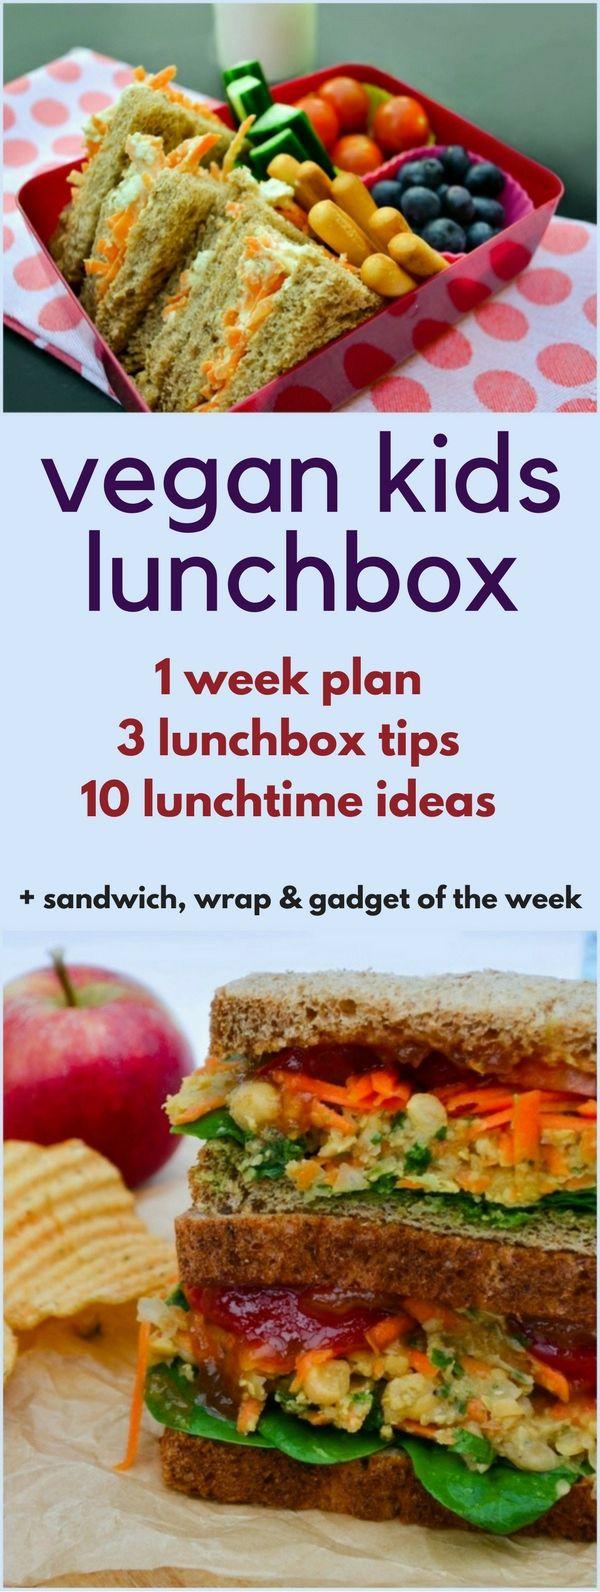 10 Vegan Lunchbox Ideas For Kids Vegan Vegan Recipes